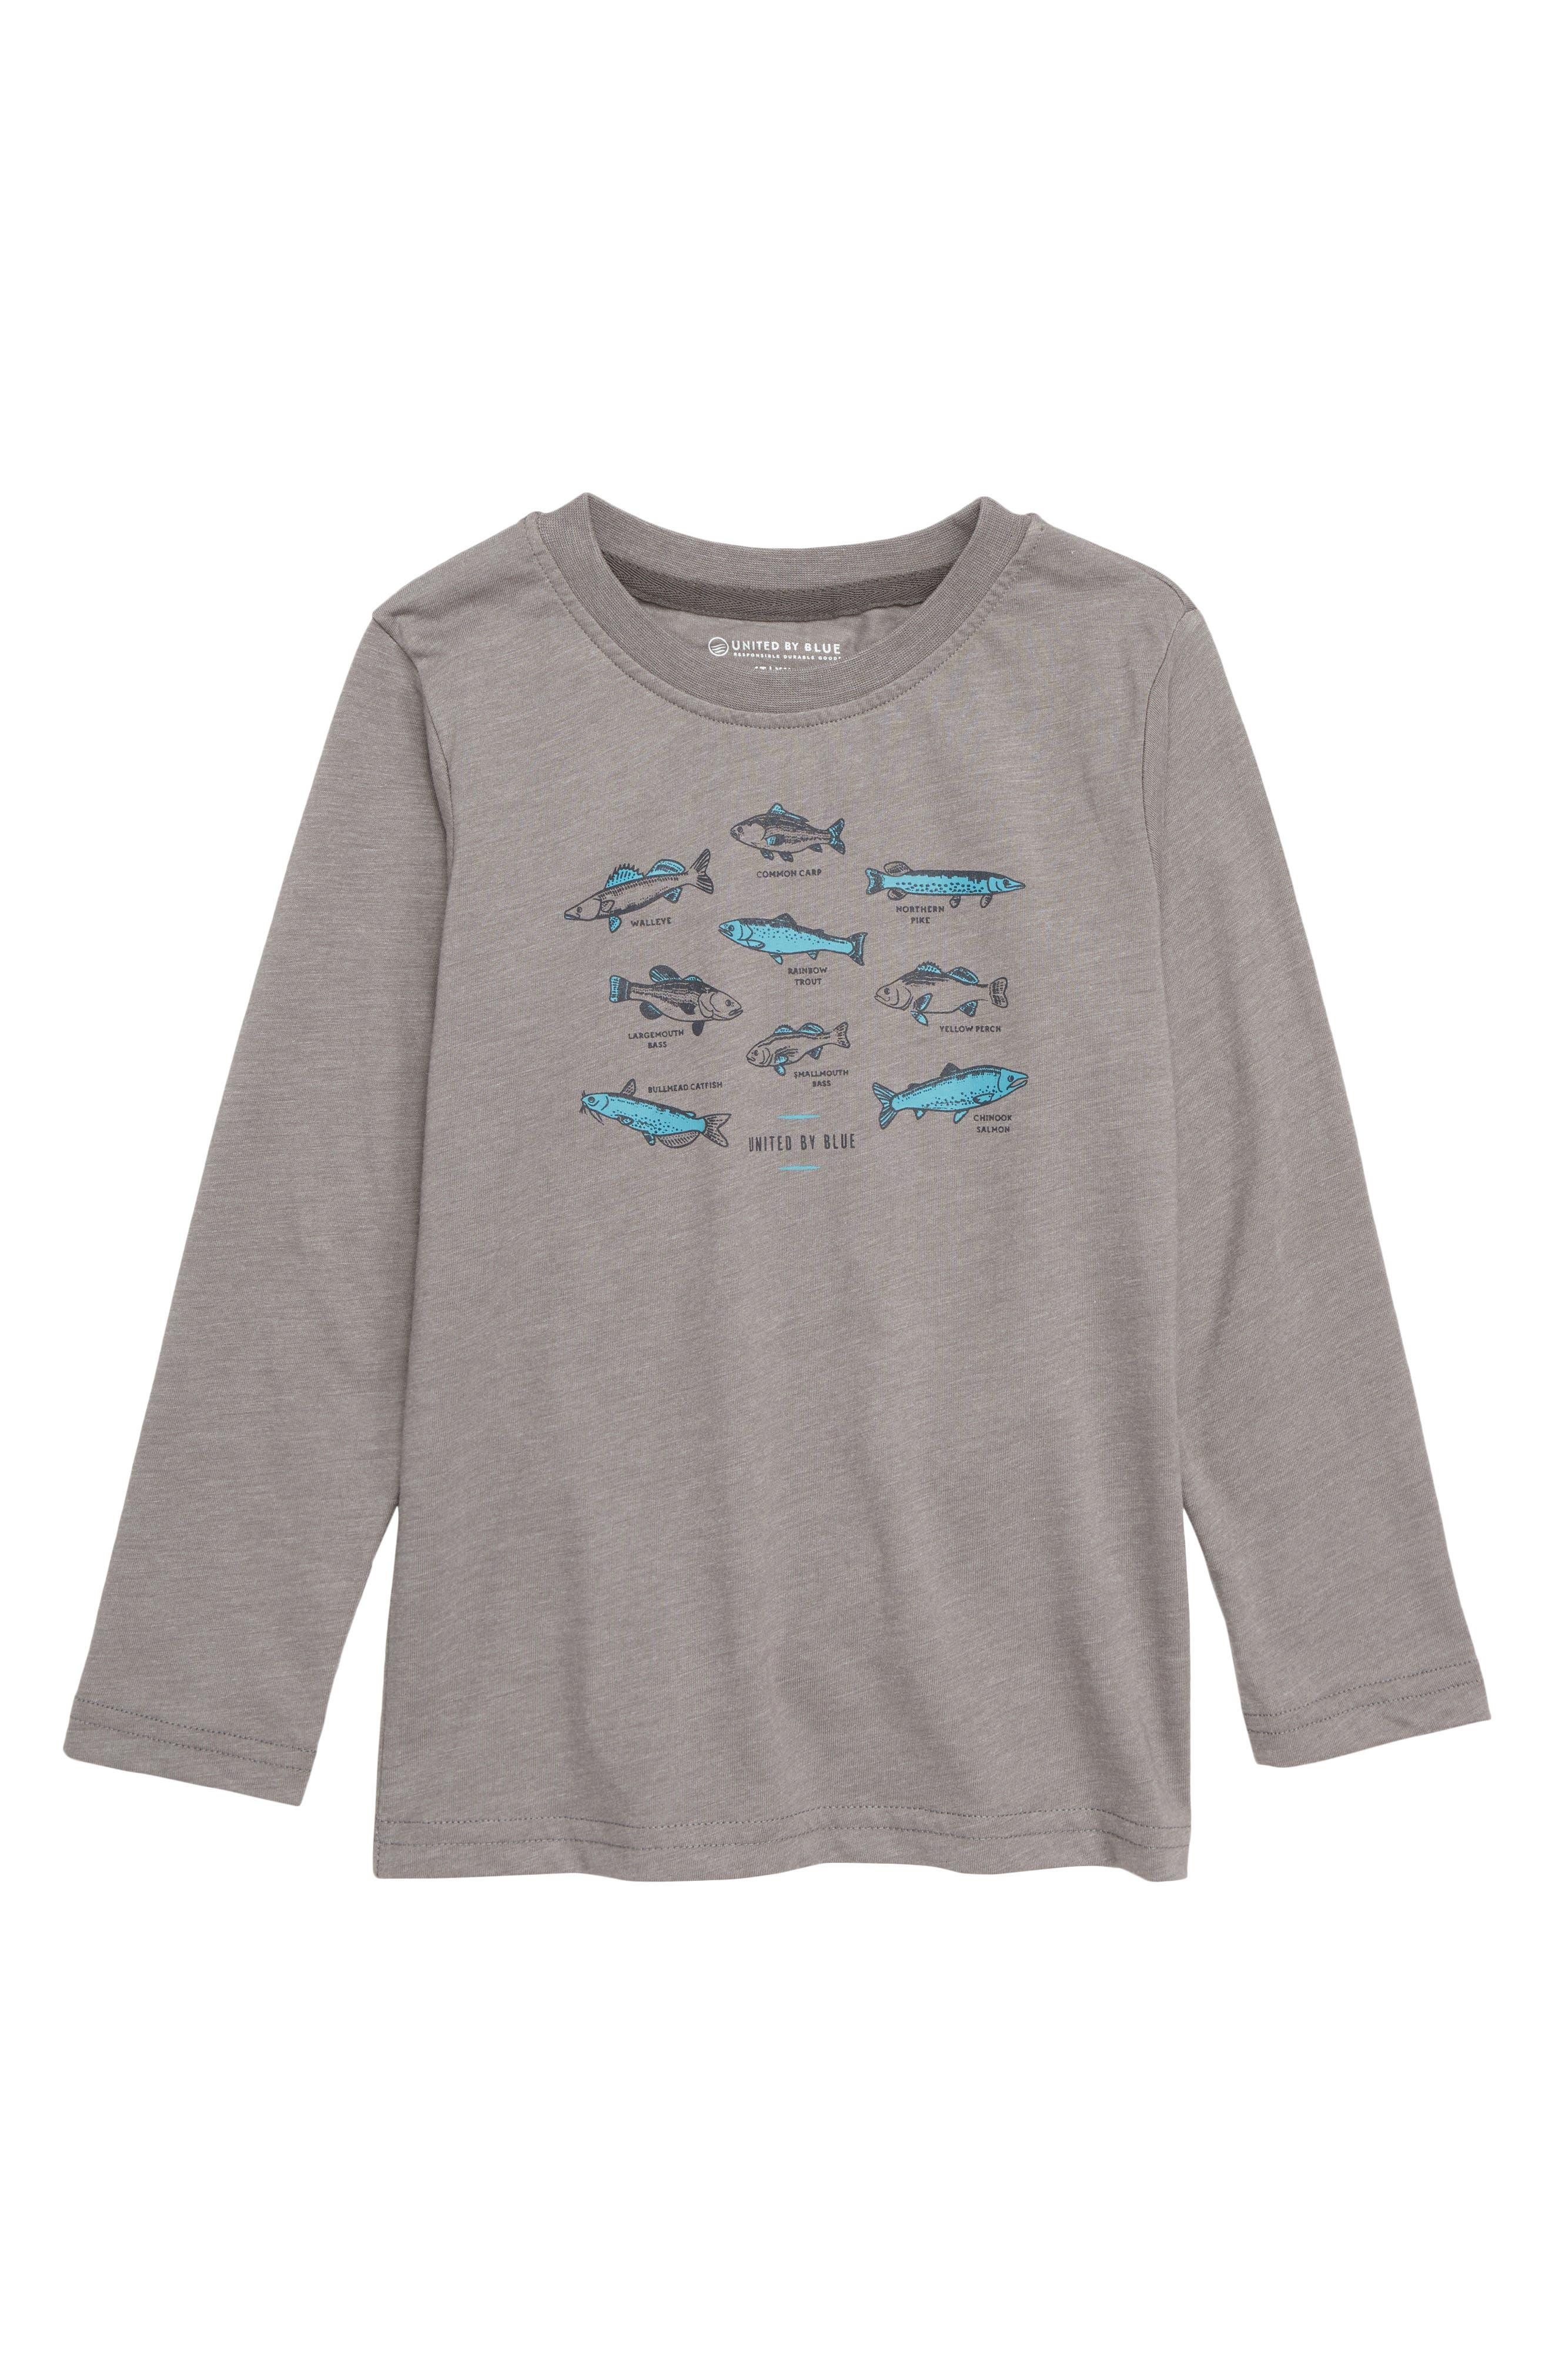 Go Fish T-Shirt,                         Main,                         color, STEEL GREY